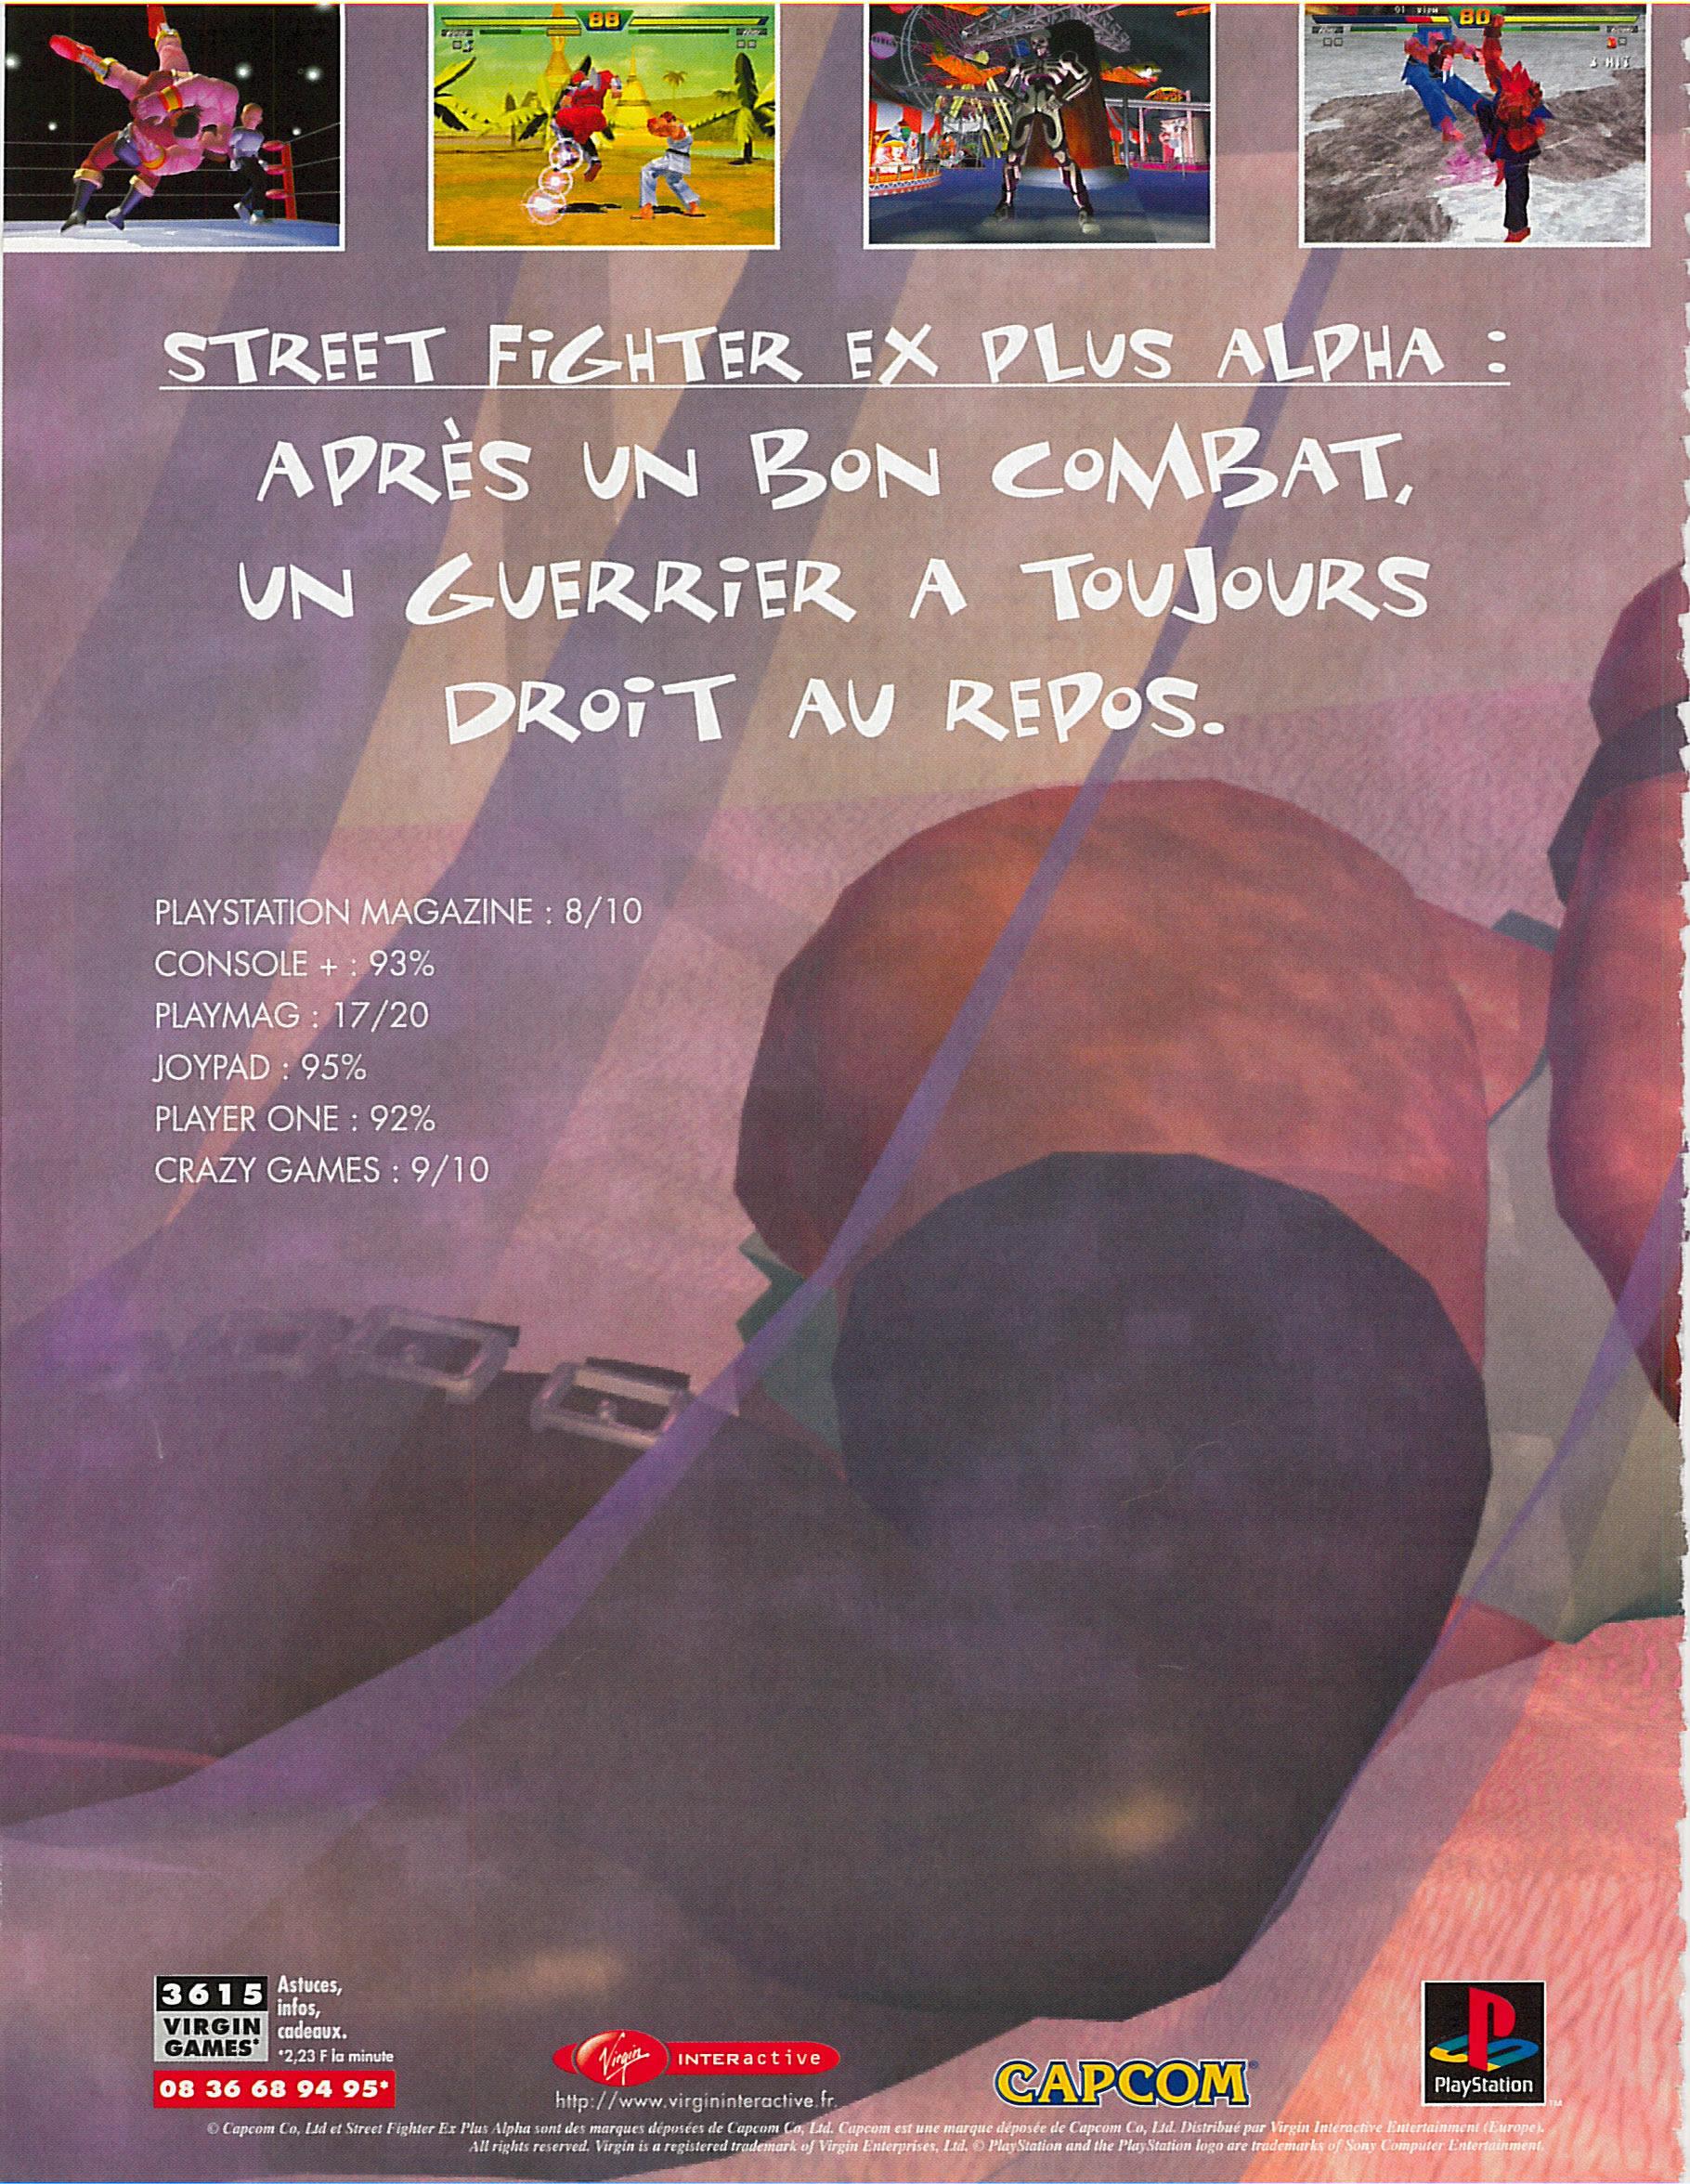 Street fighter EX plus alpha Consoles%20%2B%20069%20-%20Page%20052%20(octobre%201997)